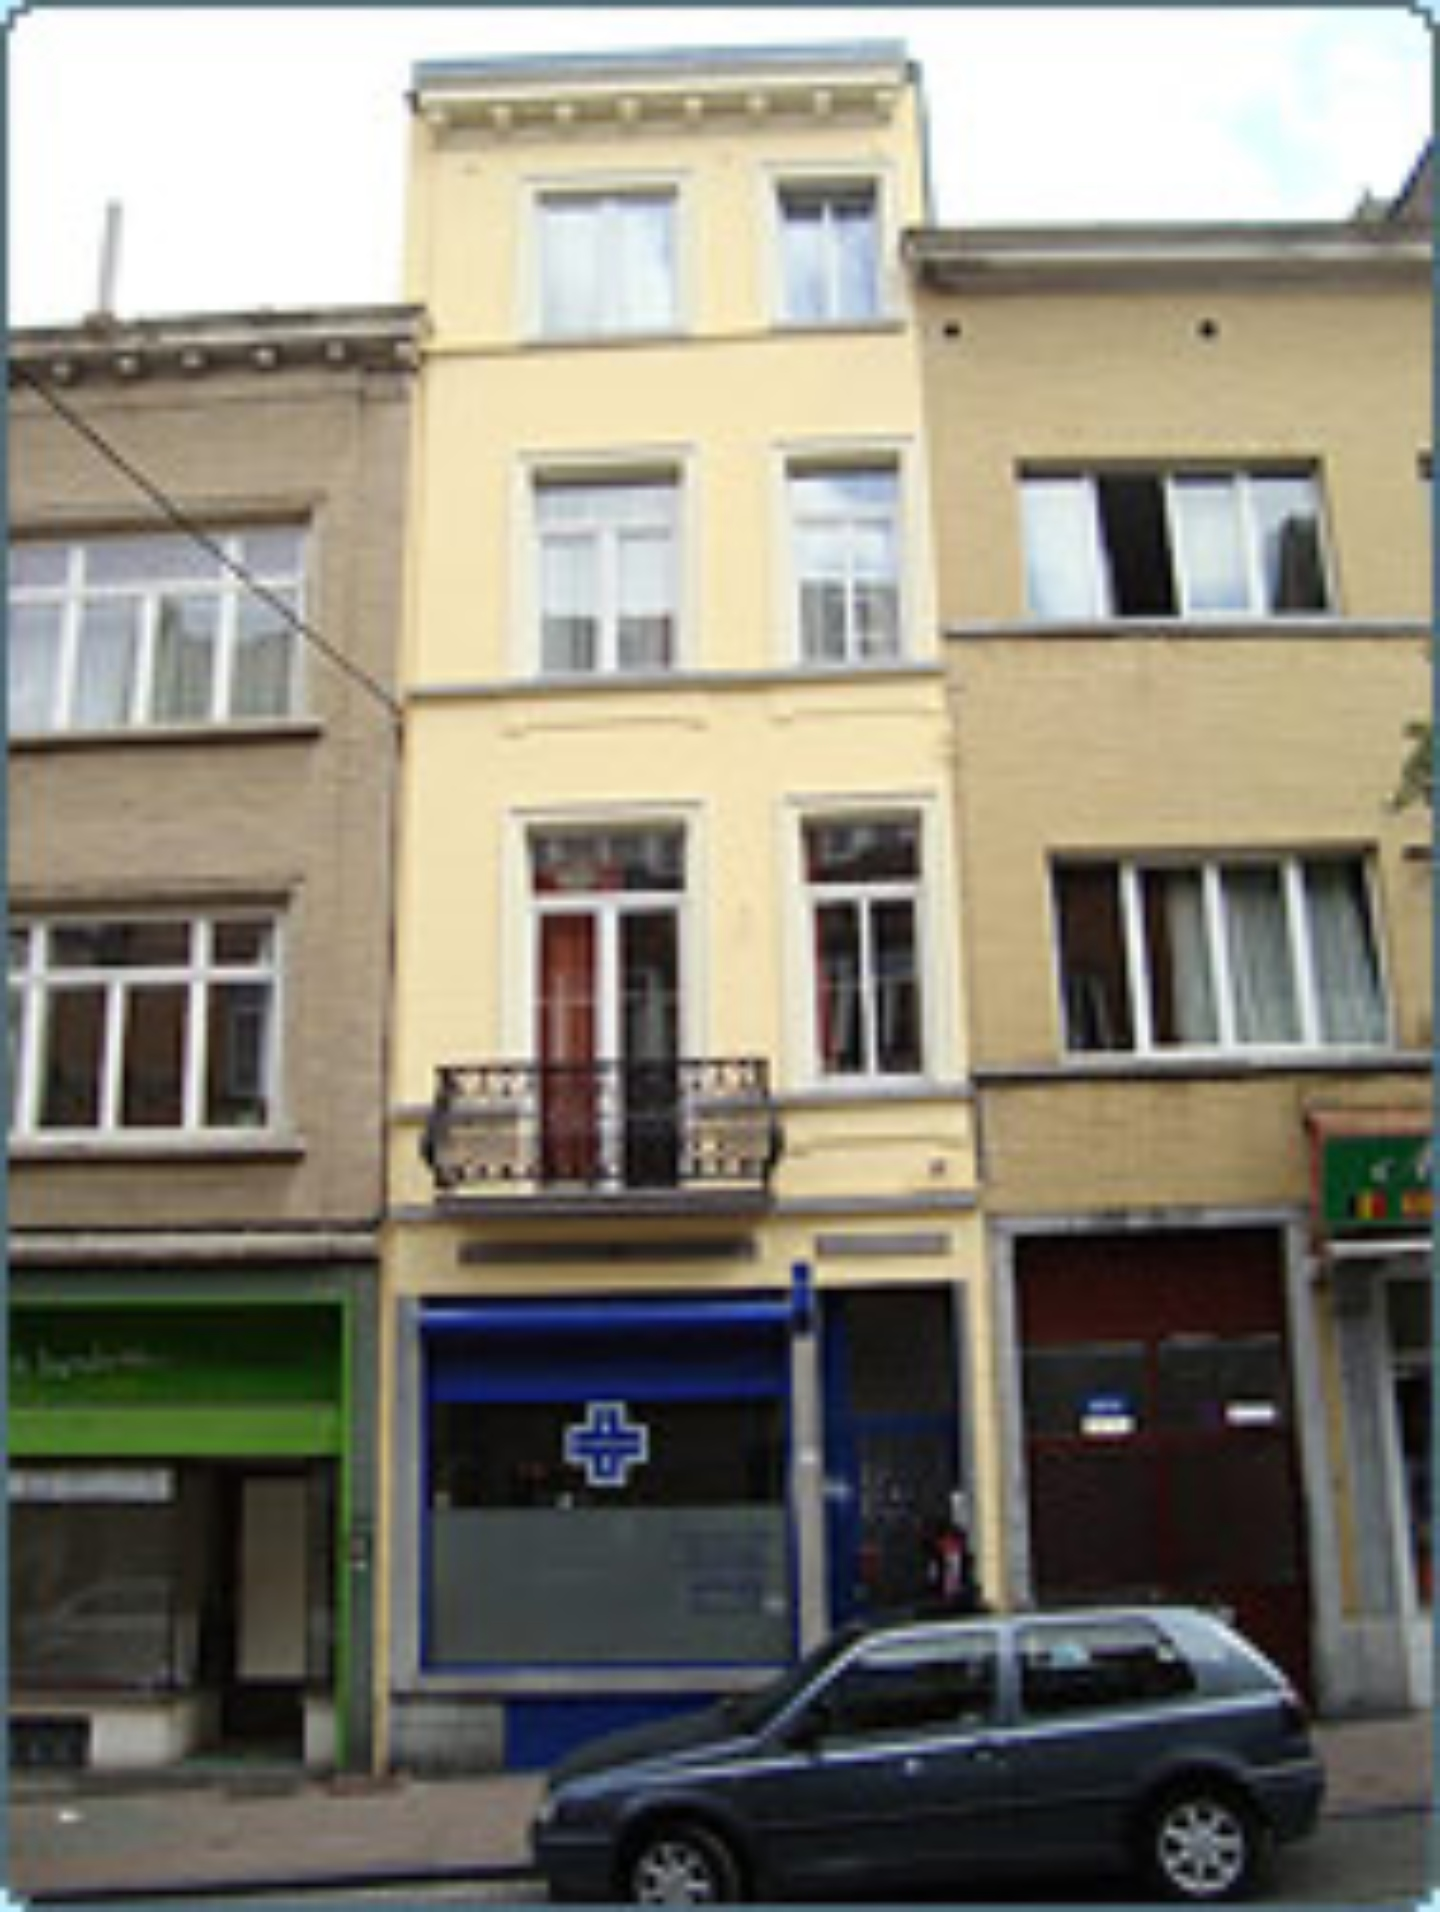 A building next to a window at CASA BELGO ARGENTINA.